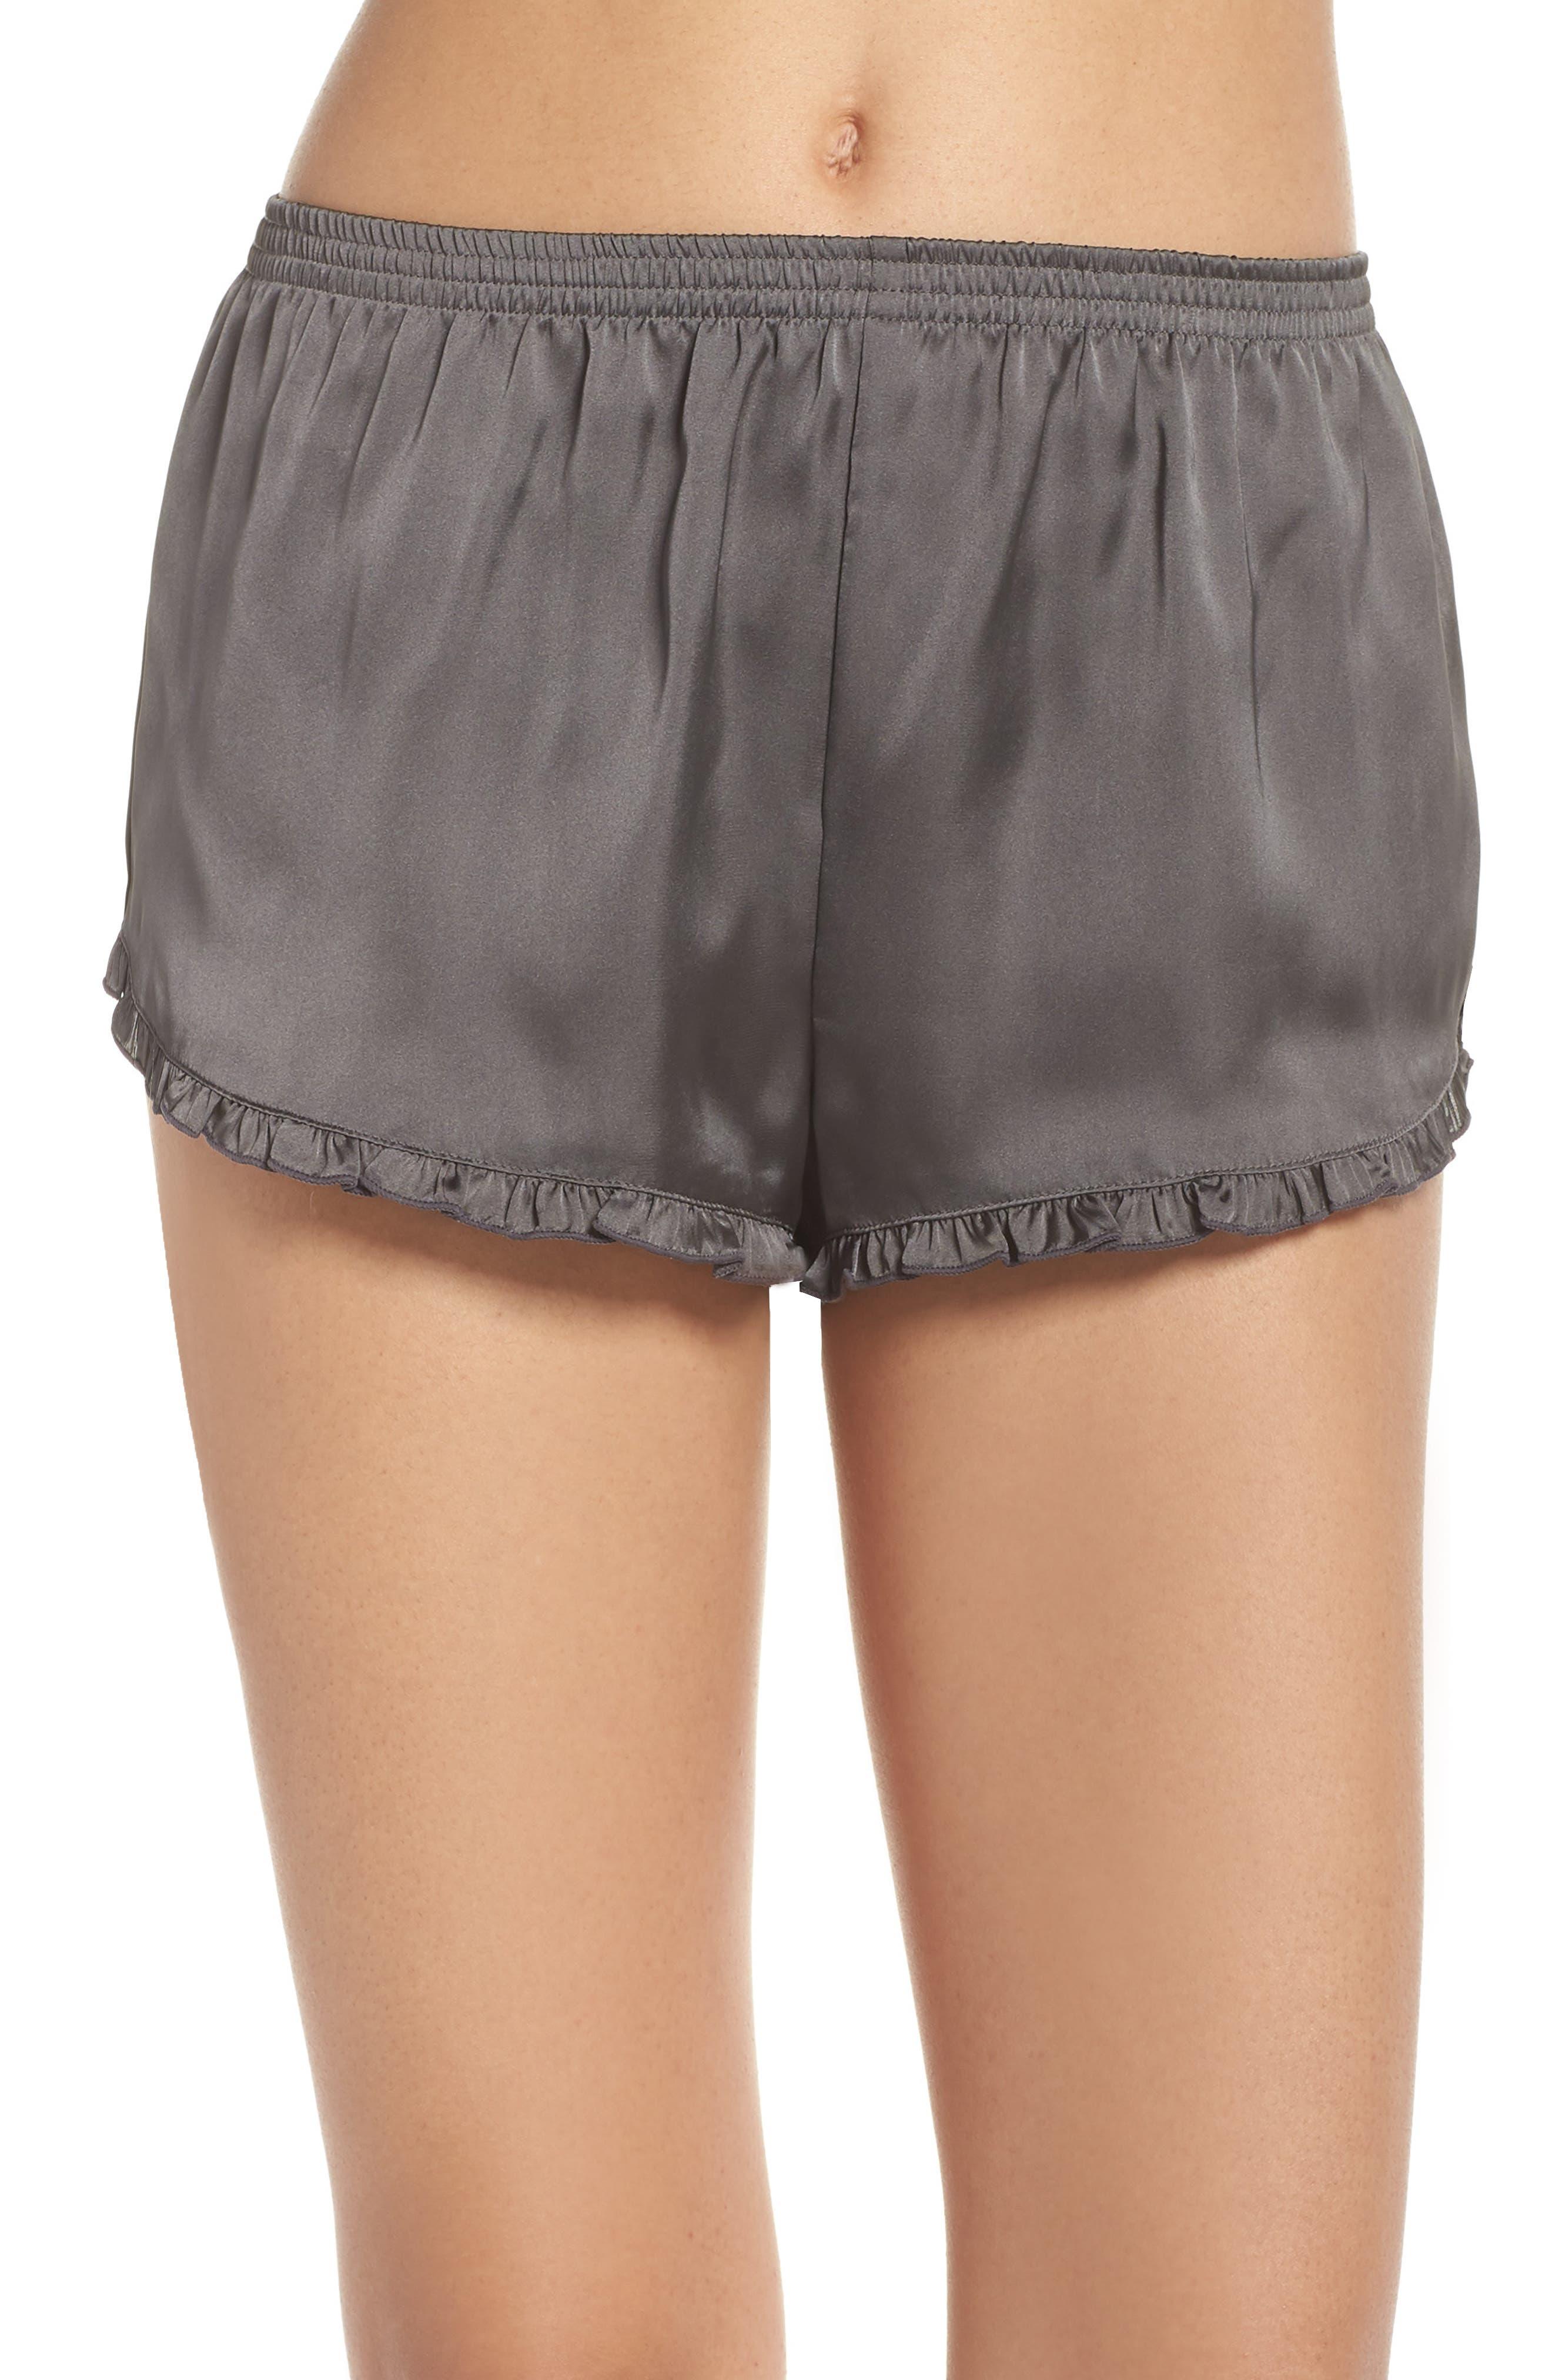 Satin Lounge Shorts,                         Main,                         color, 022